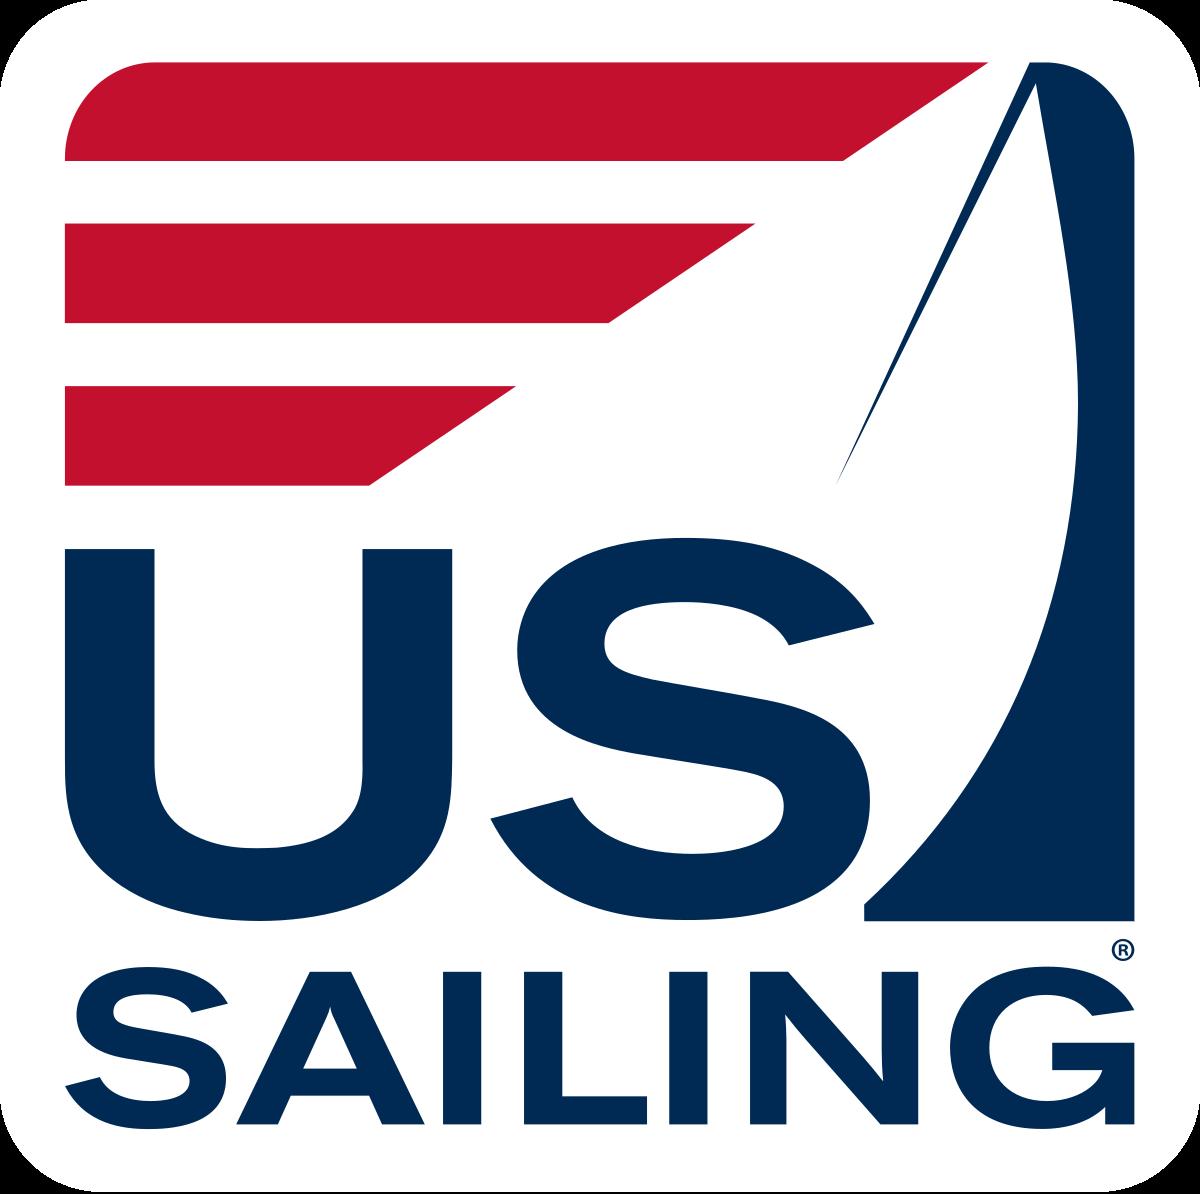 us-sailing-logo-zim-sailing.png